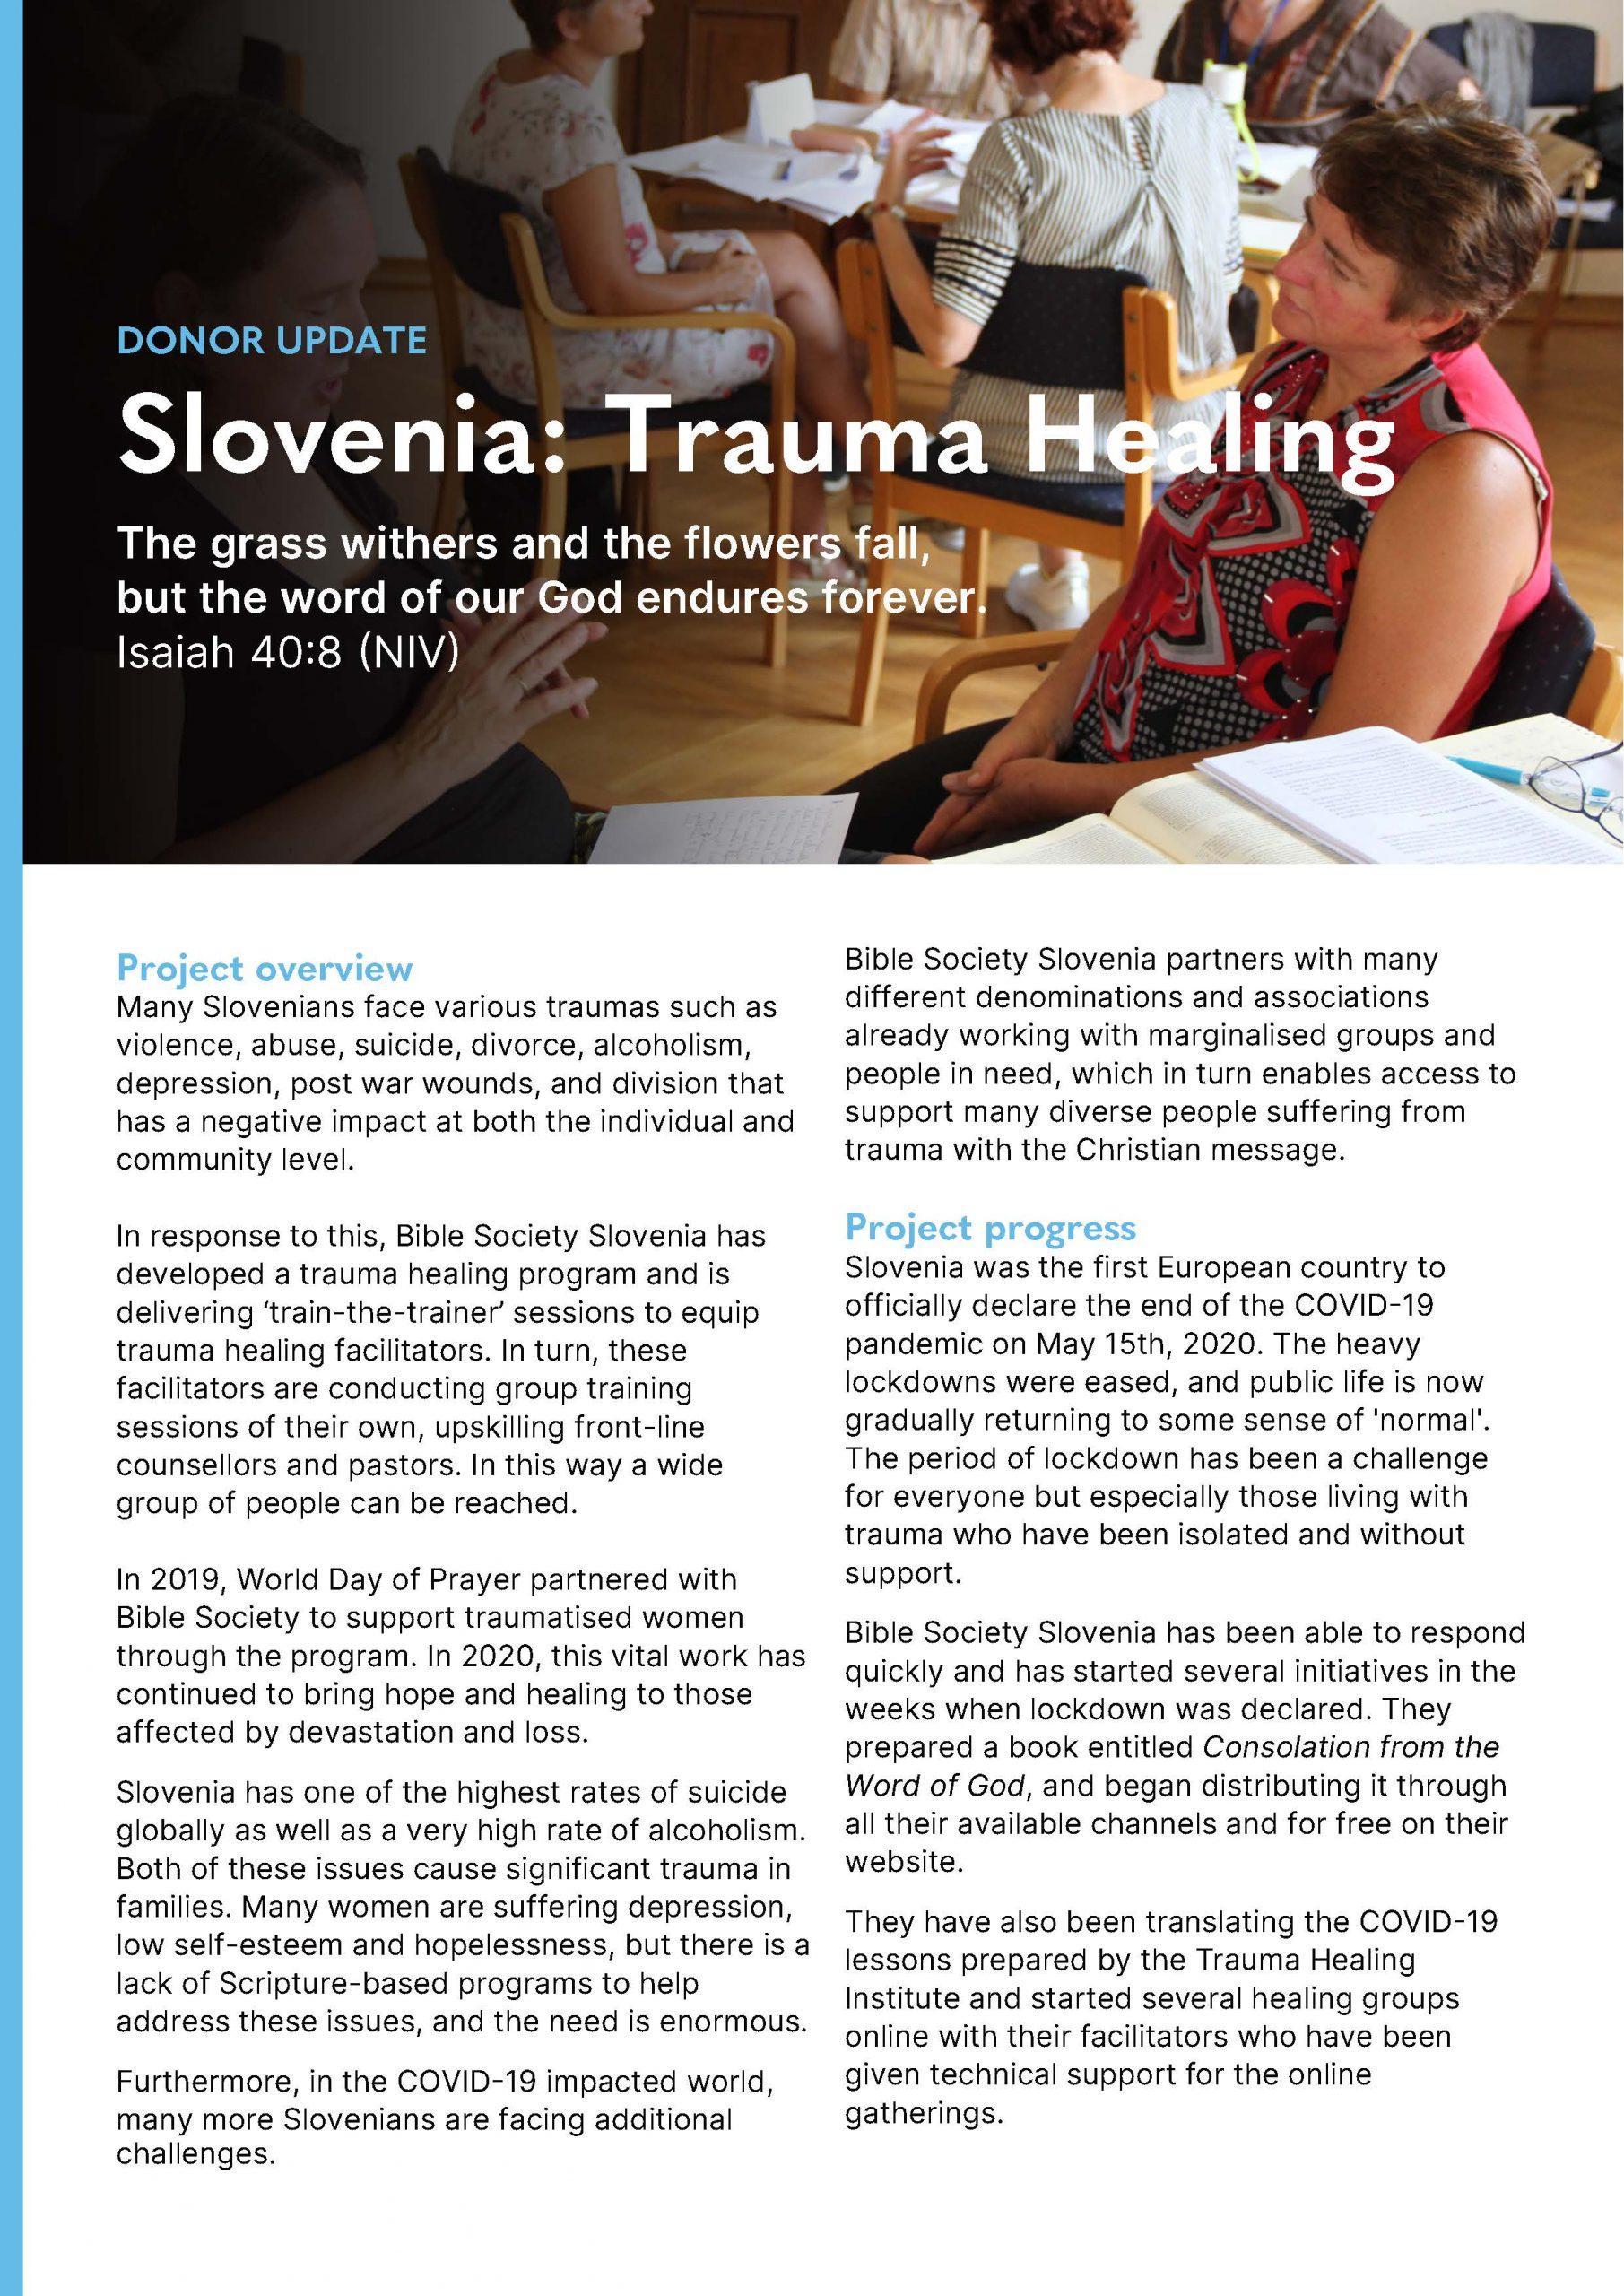 DONOR UPDATE Slovenia: Trauma Healing